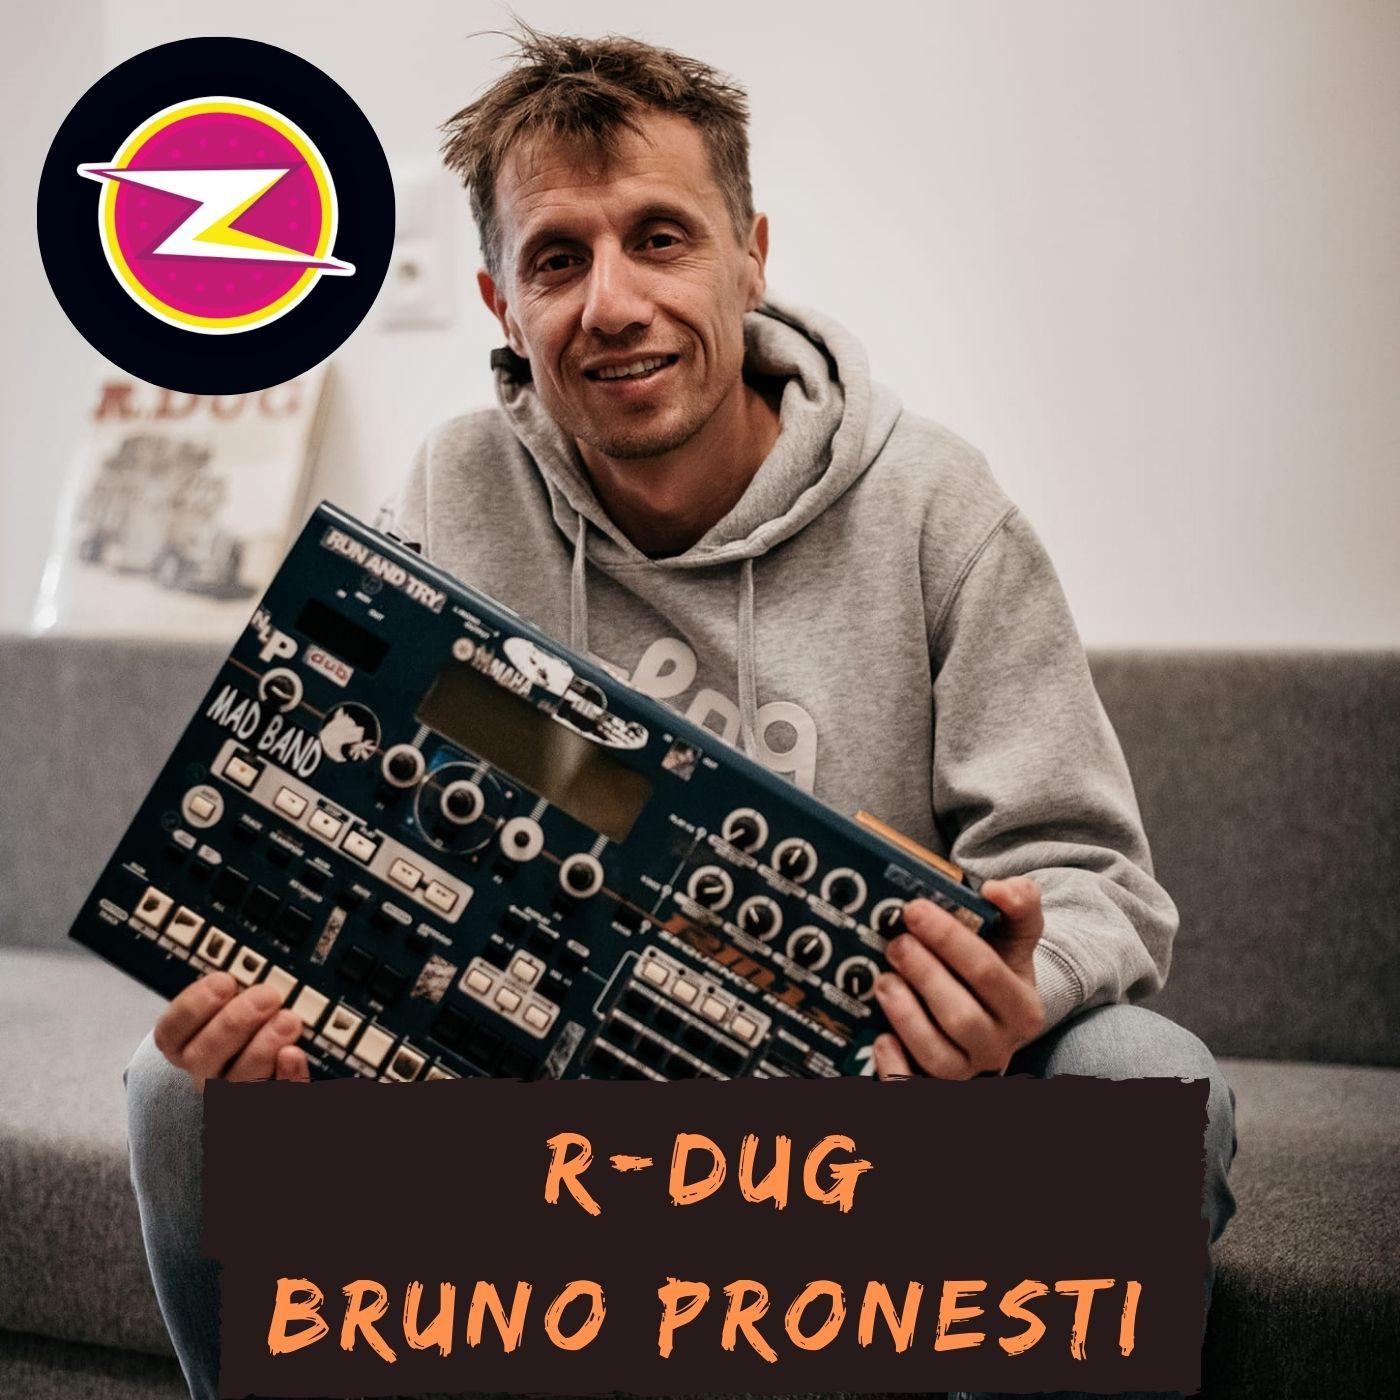 R-Dug alias Bruno Pronesti